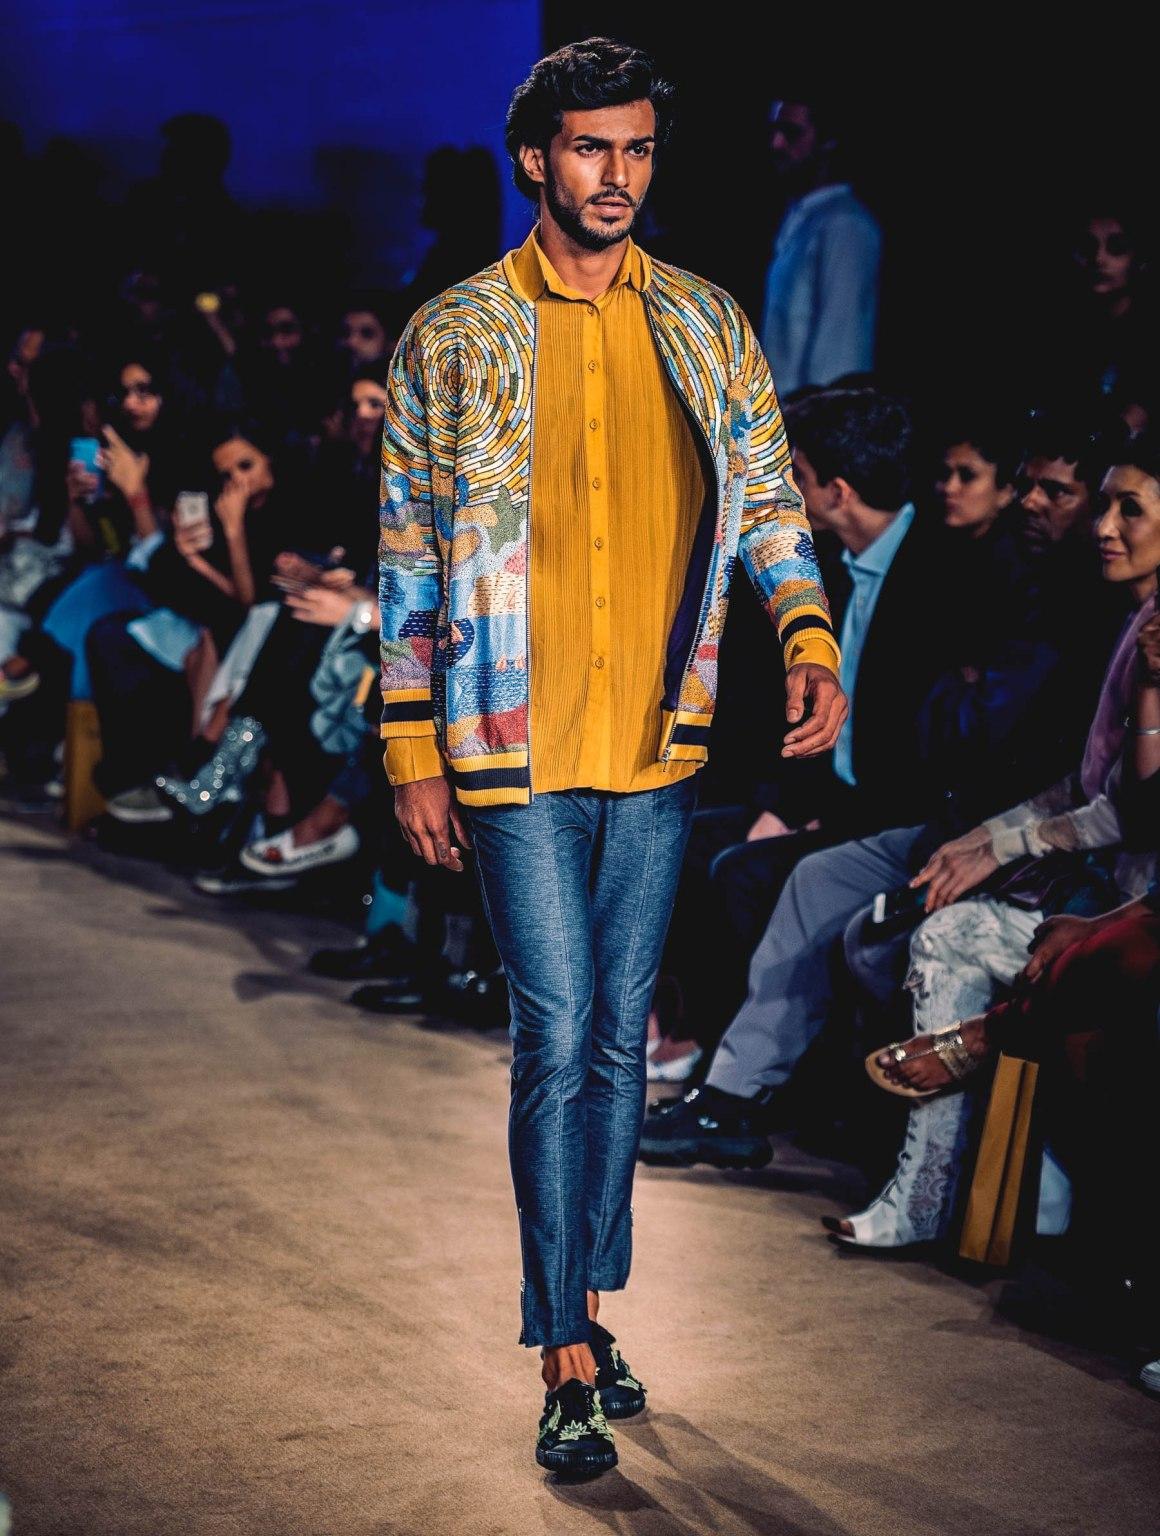 #EyesForFashion, #MadeInIndia, 10YearsOfRahulMishra, Aarna Mishra, Autumn Winter, Blogger Naina, Decade, delhi, Delhi Fashion Week, Divya Mishra, embroidery, Fashion Design Council of India, fashion show, FDCI, French Knots, From The Archives, Gurgaon, India, india fashion week, Indian Fashion Designer, Jawaharlal Nehru Stadium, lifestyle blogger, lifestyle photographer, Liva, LMIFWAW19, Lotus Makeup India Fashion Week, luxury blogger, luxury photographer, Metamorphosis, naina redhu, naina.co, Photographer Naina, Professional Blogger, professional photographer, Rahul Mishra, Reinvention, Retrospect, Retrospection, Retrospective, Runway, Structured Garments, Ten Seasons of Paris Fashion Week, textiles, Weaves